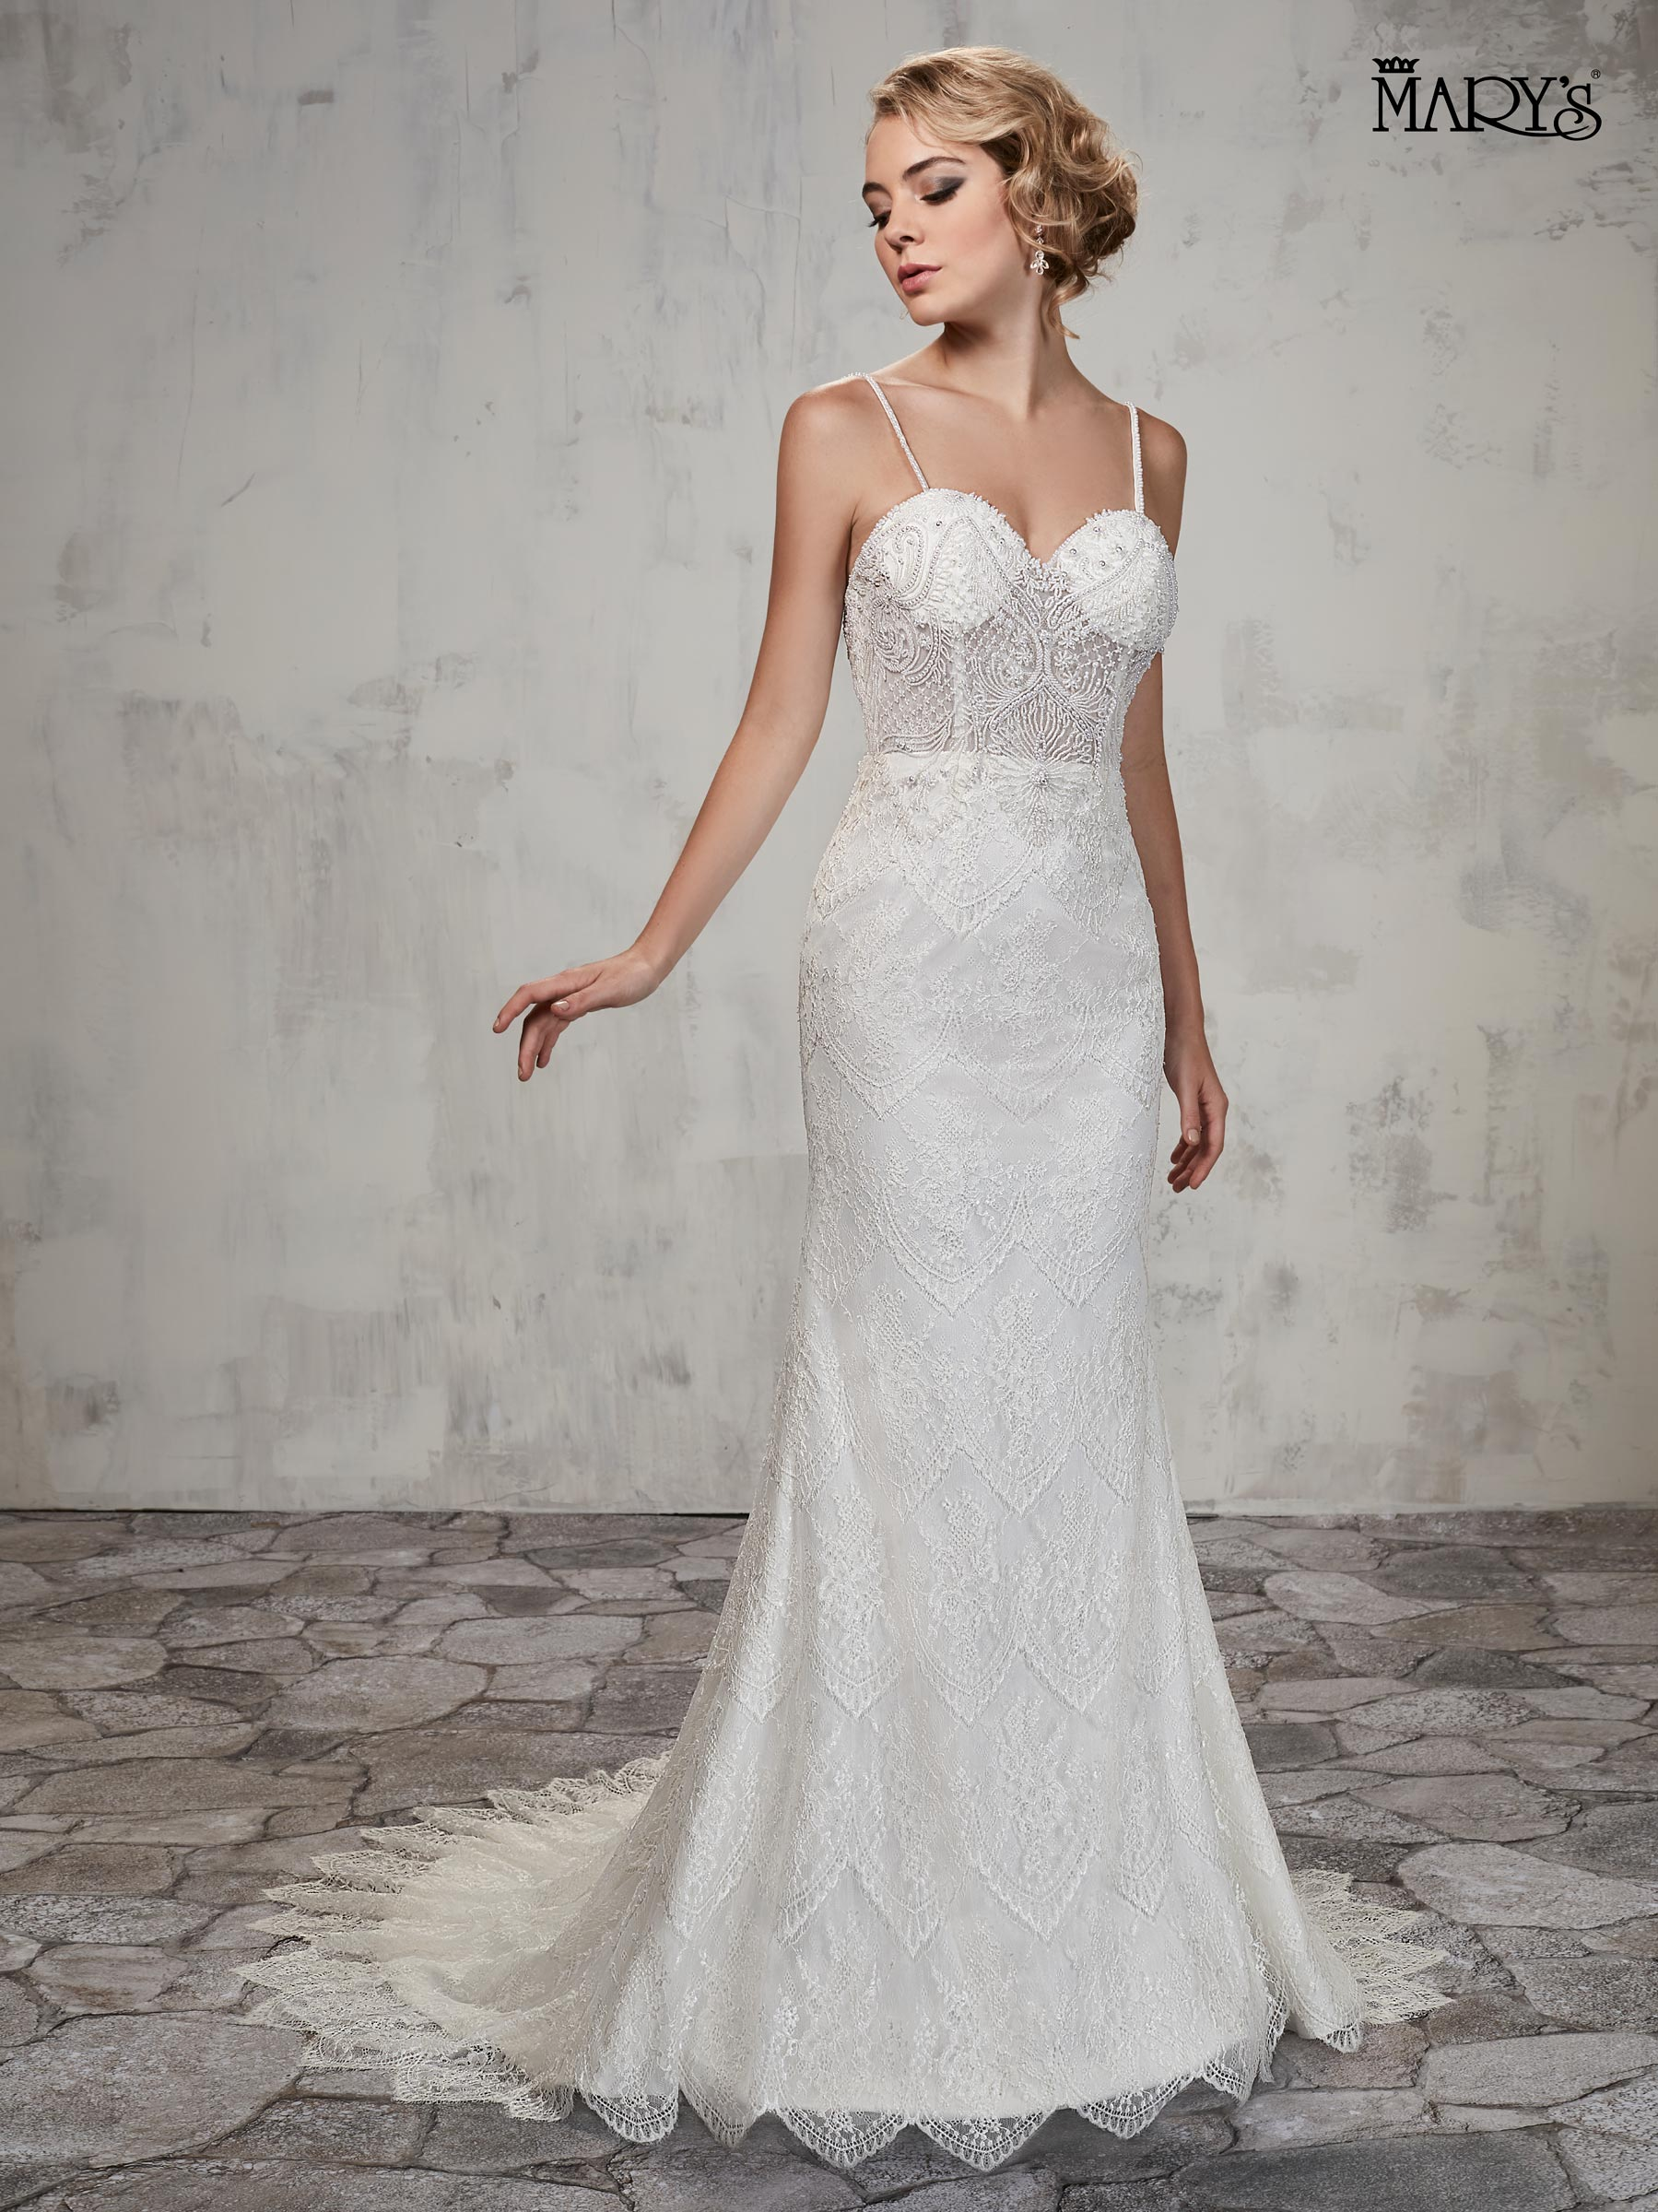 Bridal Wedding Dresses   Mary's   Style - MB3008